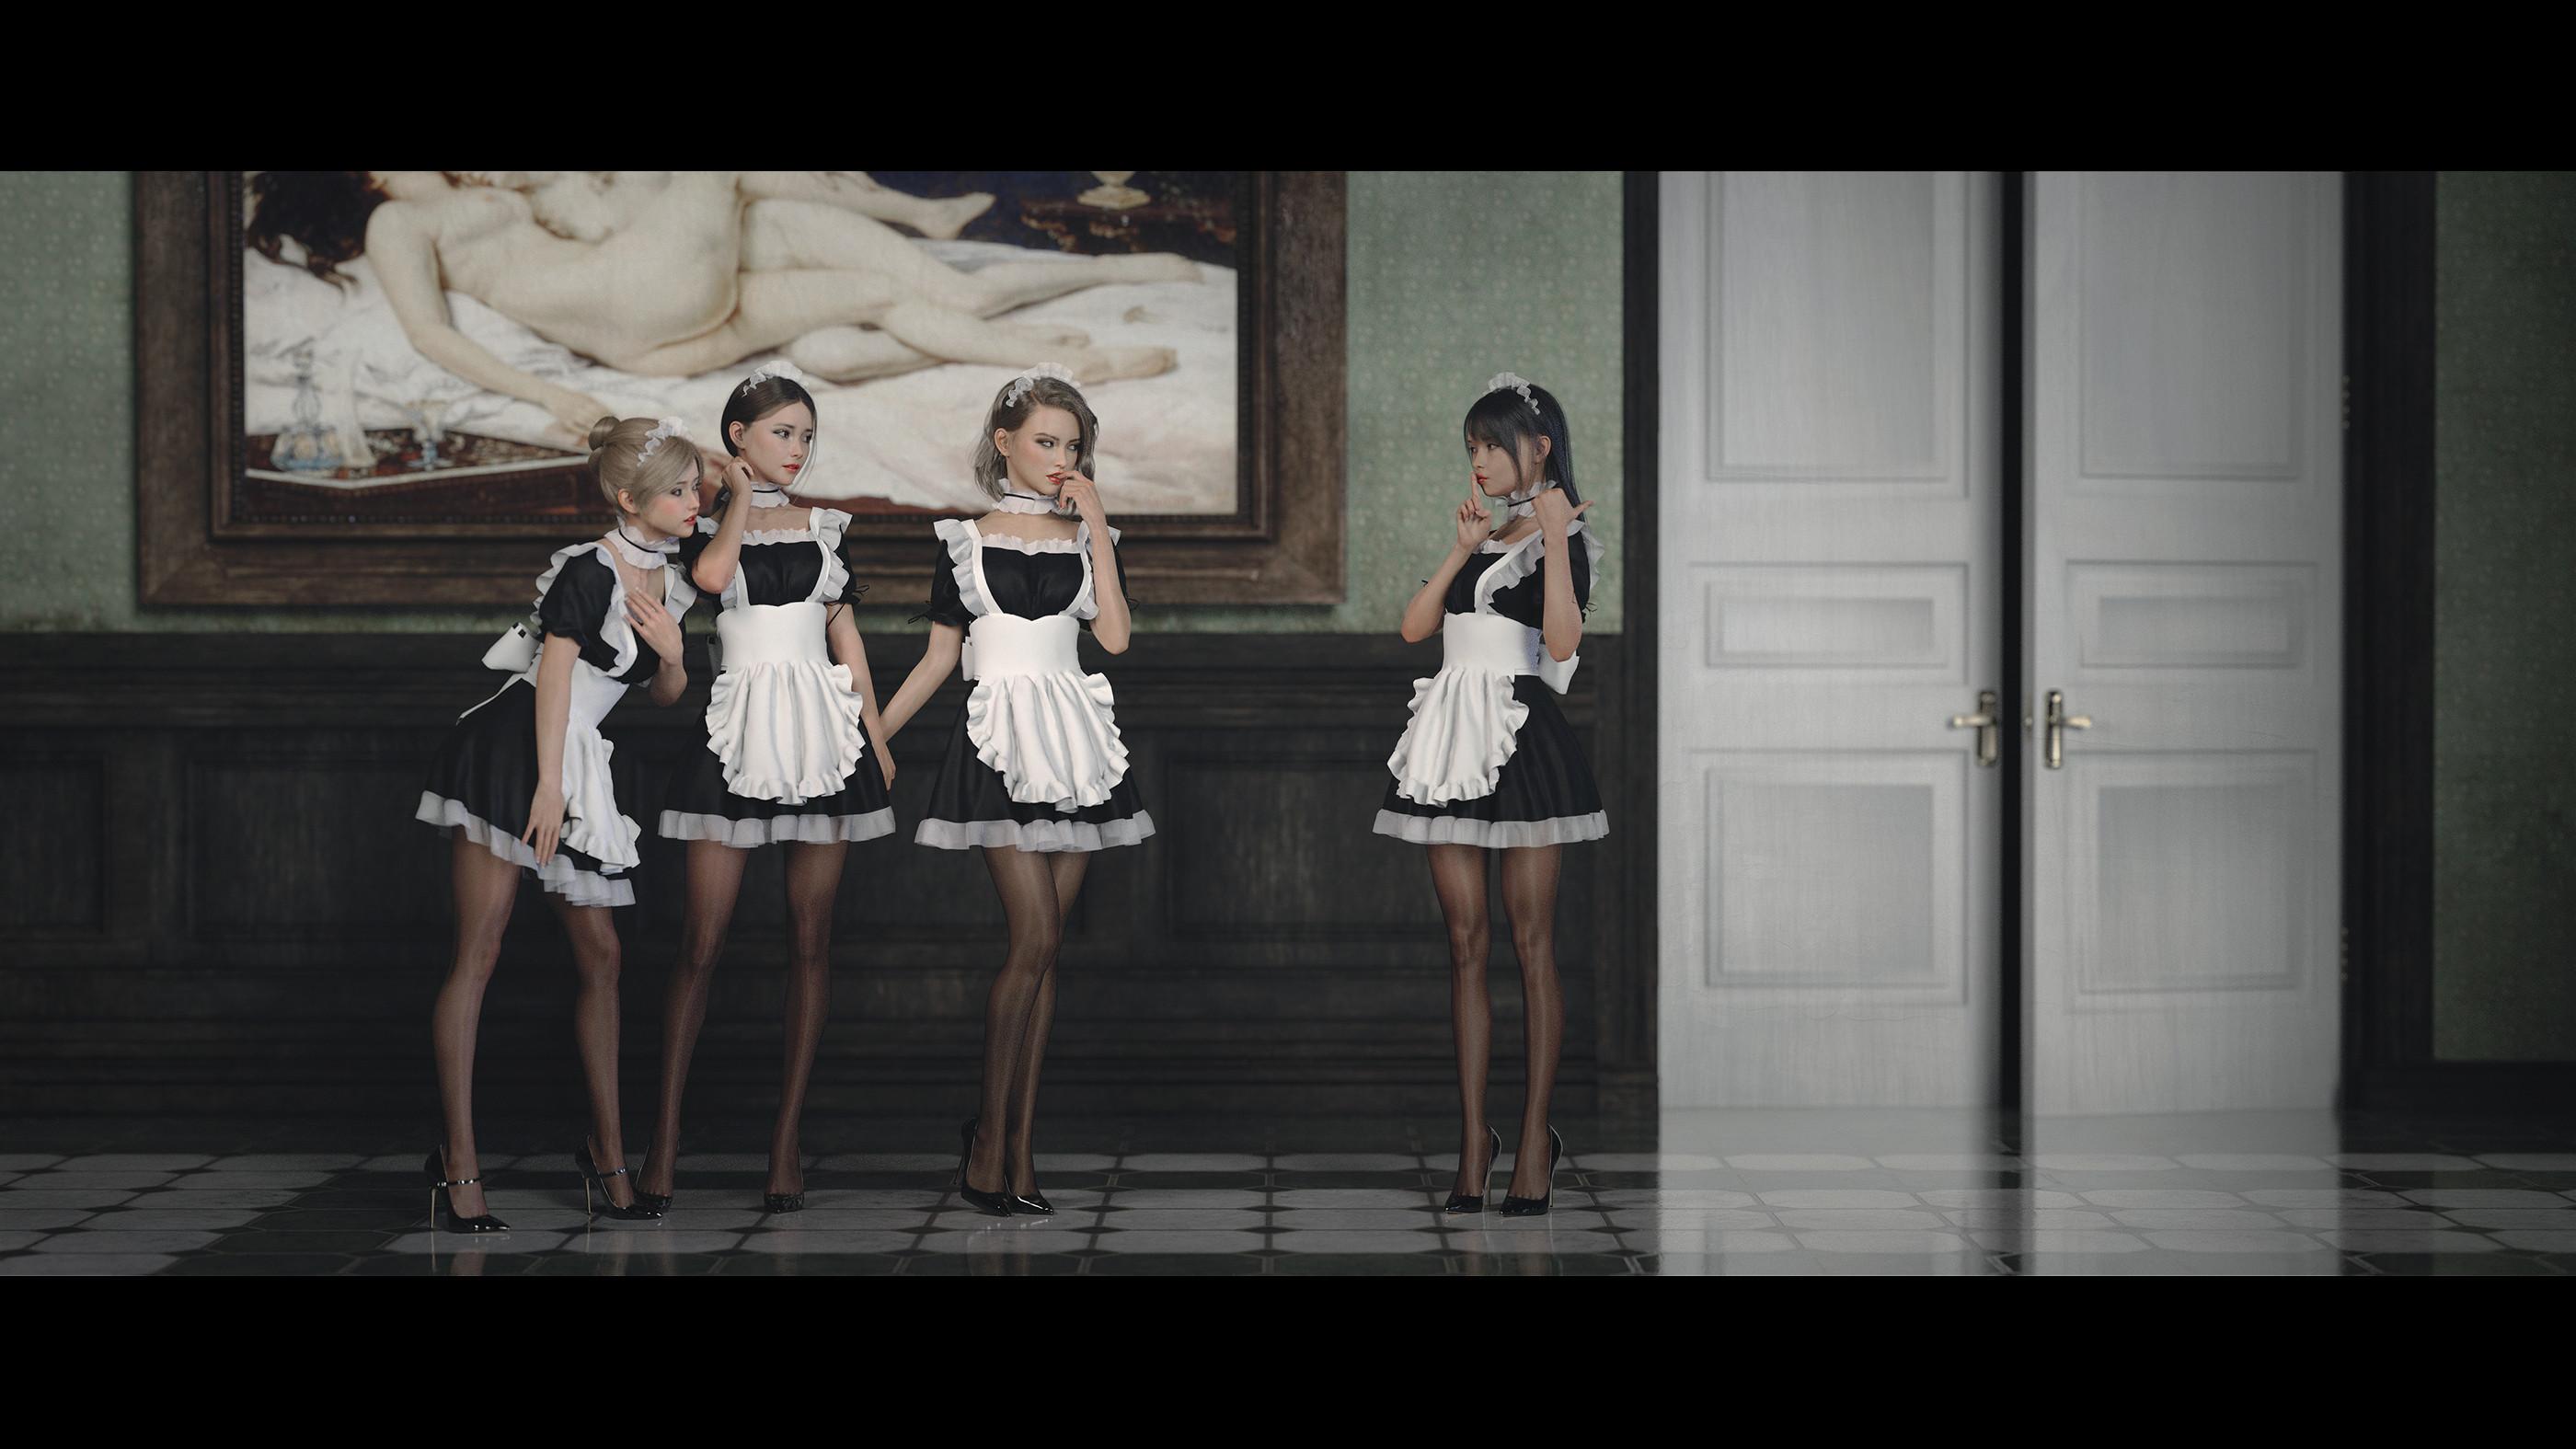 General 2800x1575 maiden women heels black heels pantyhose dark hair blonde legs Lou LL ArroLL maid outfit 3D LouLL_Aroll apron